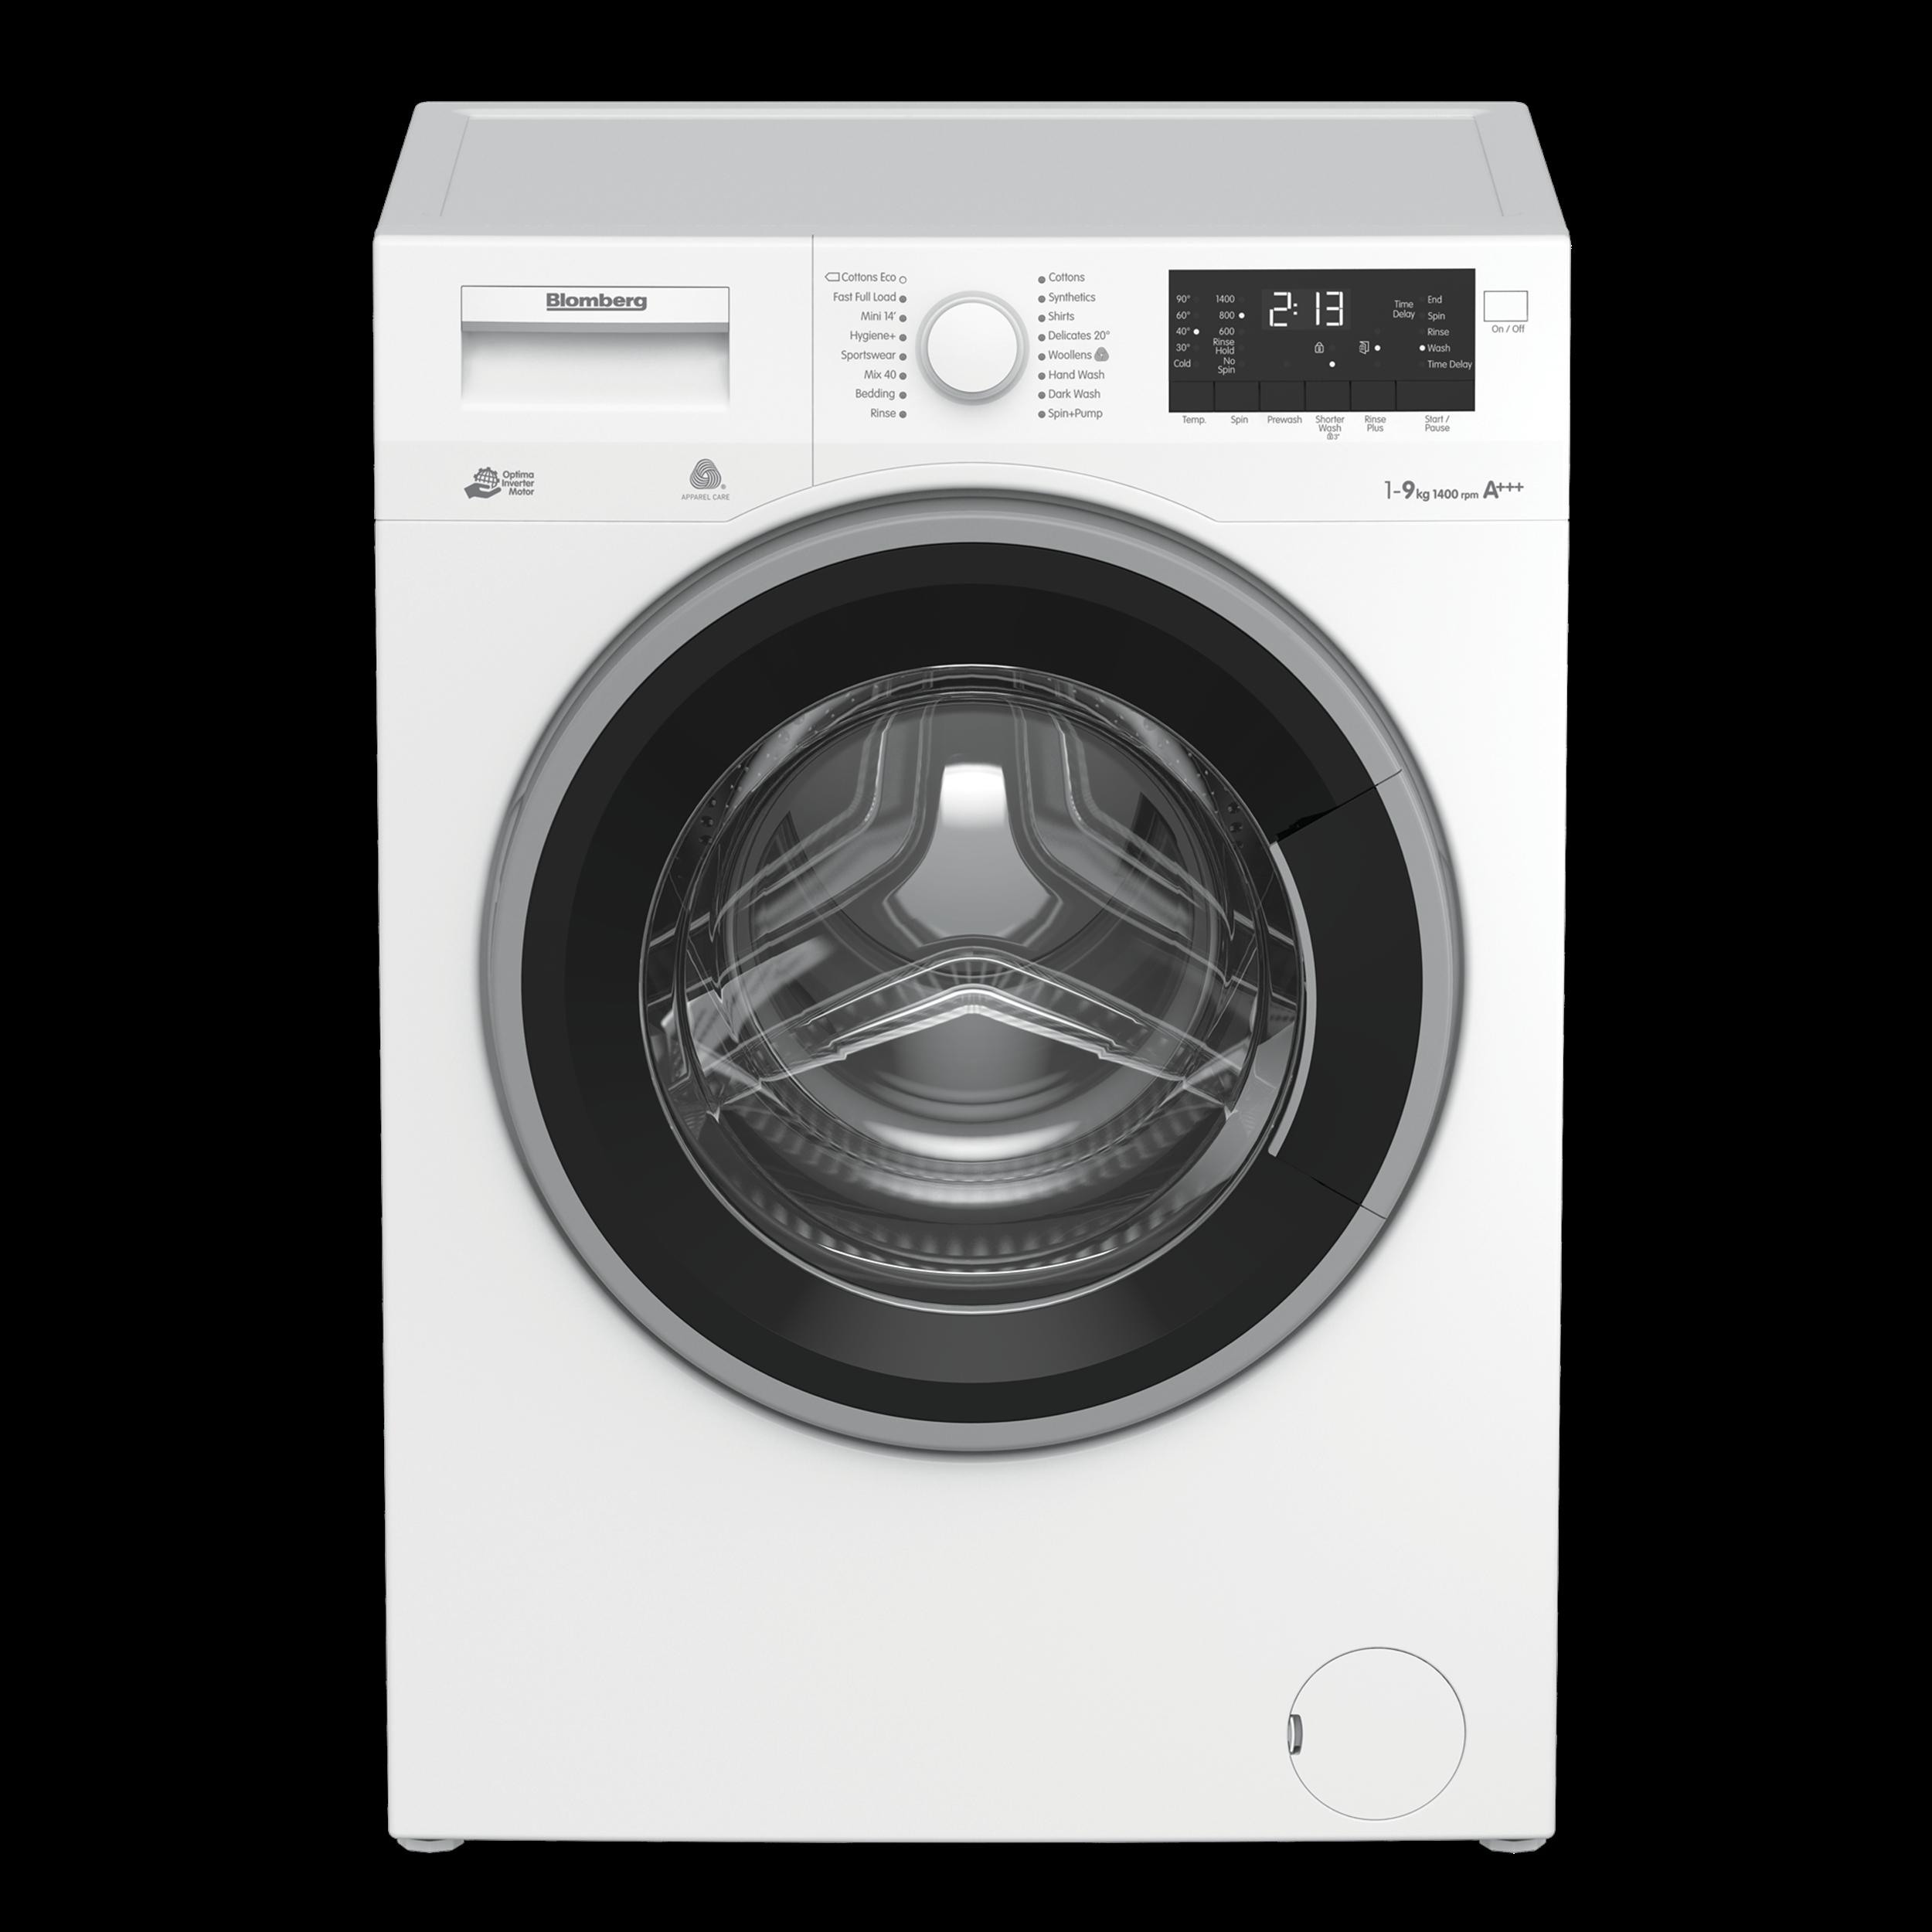 Image result for washing machine